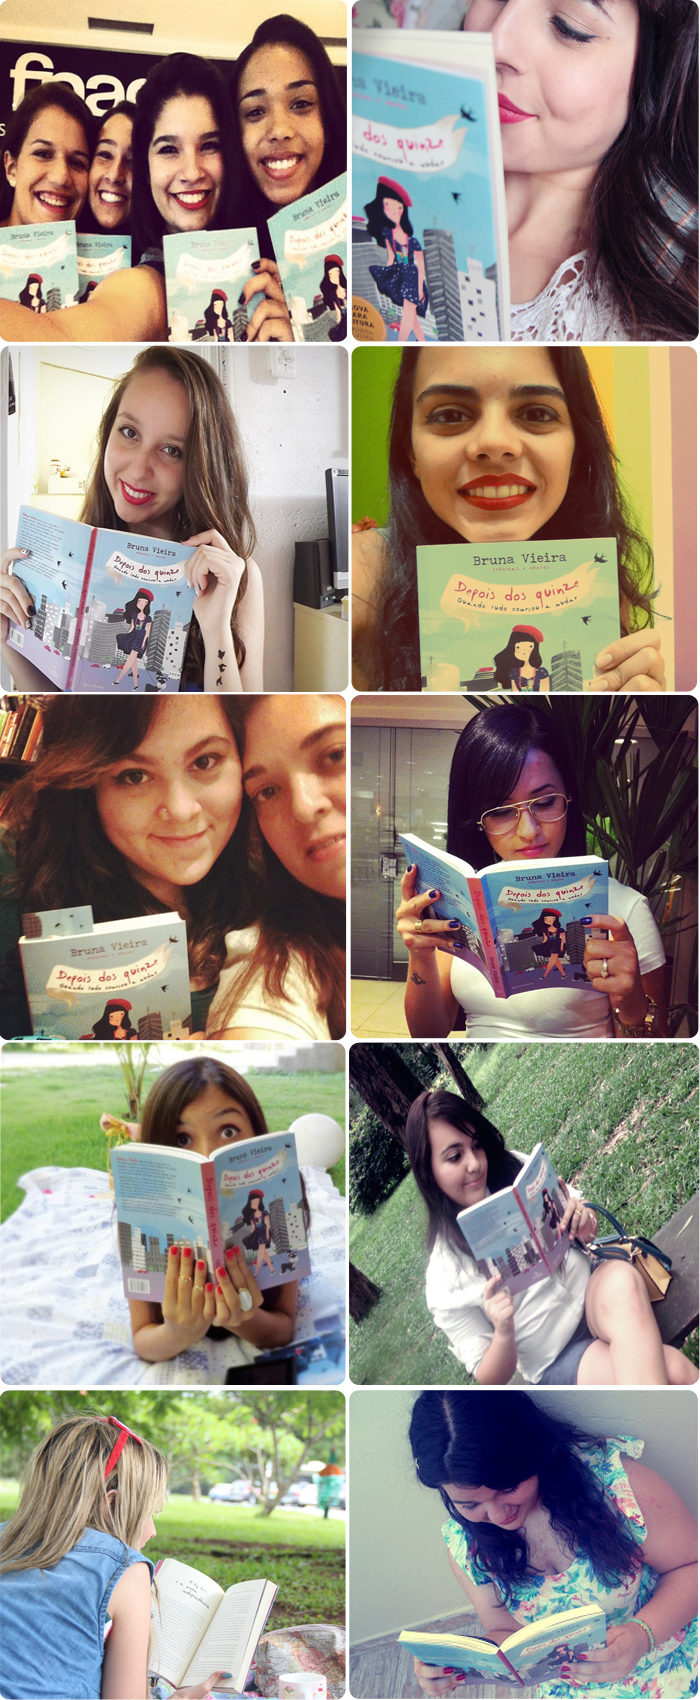 livro-adolescente-2013